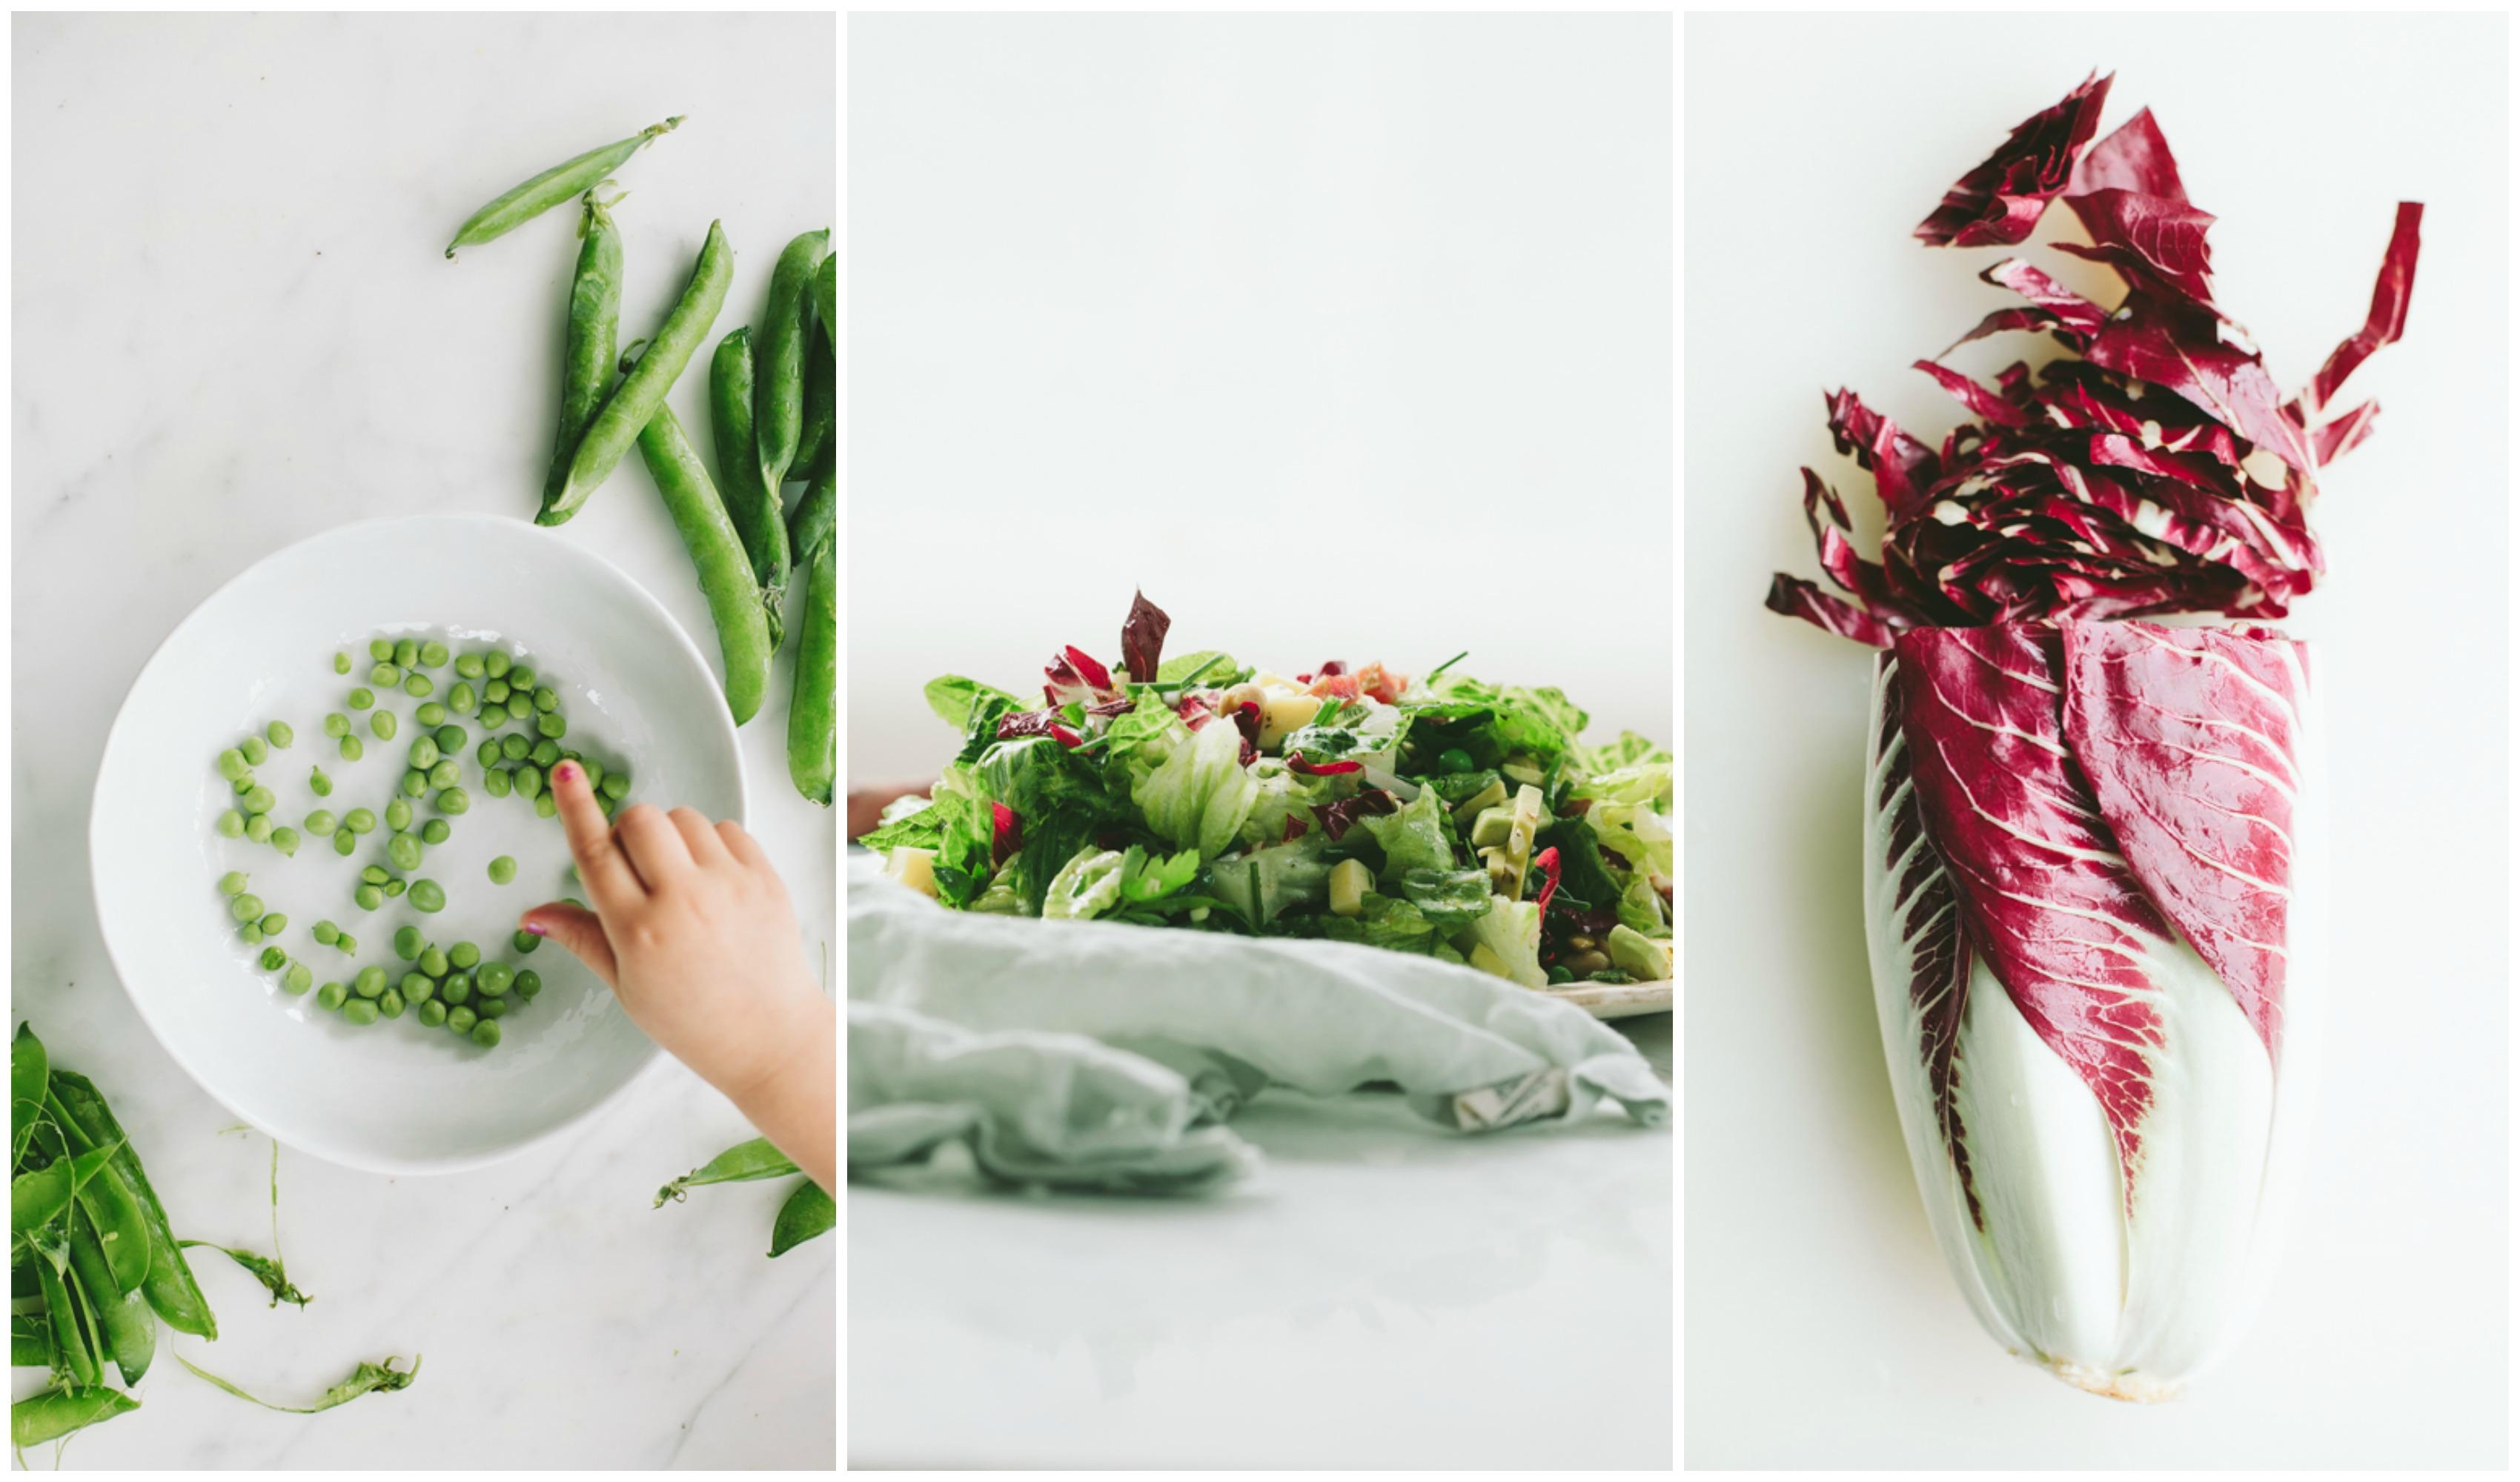 foodphotographycollage